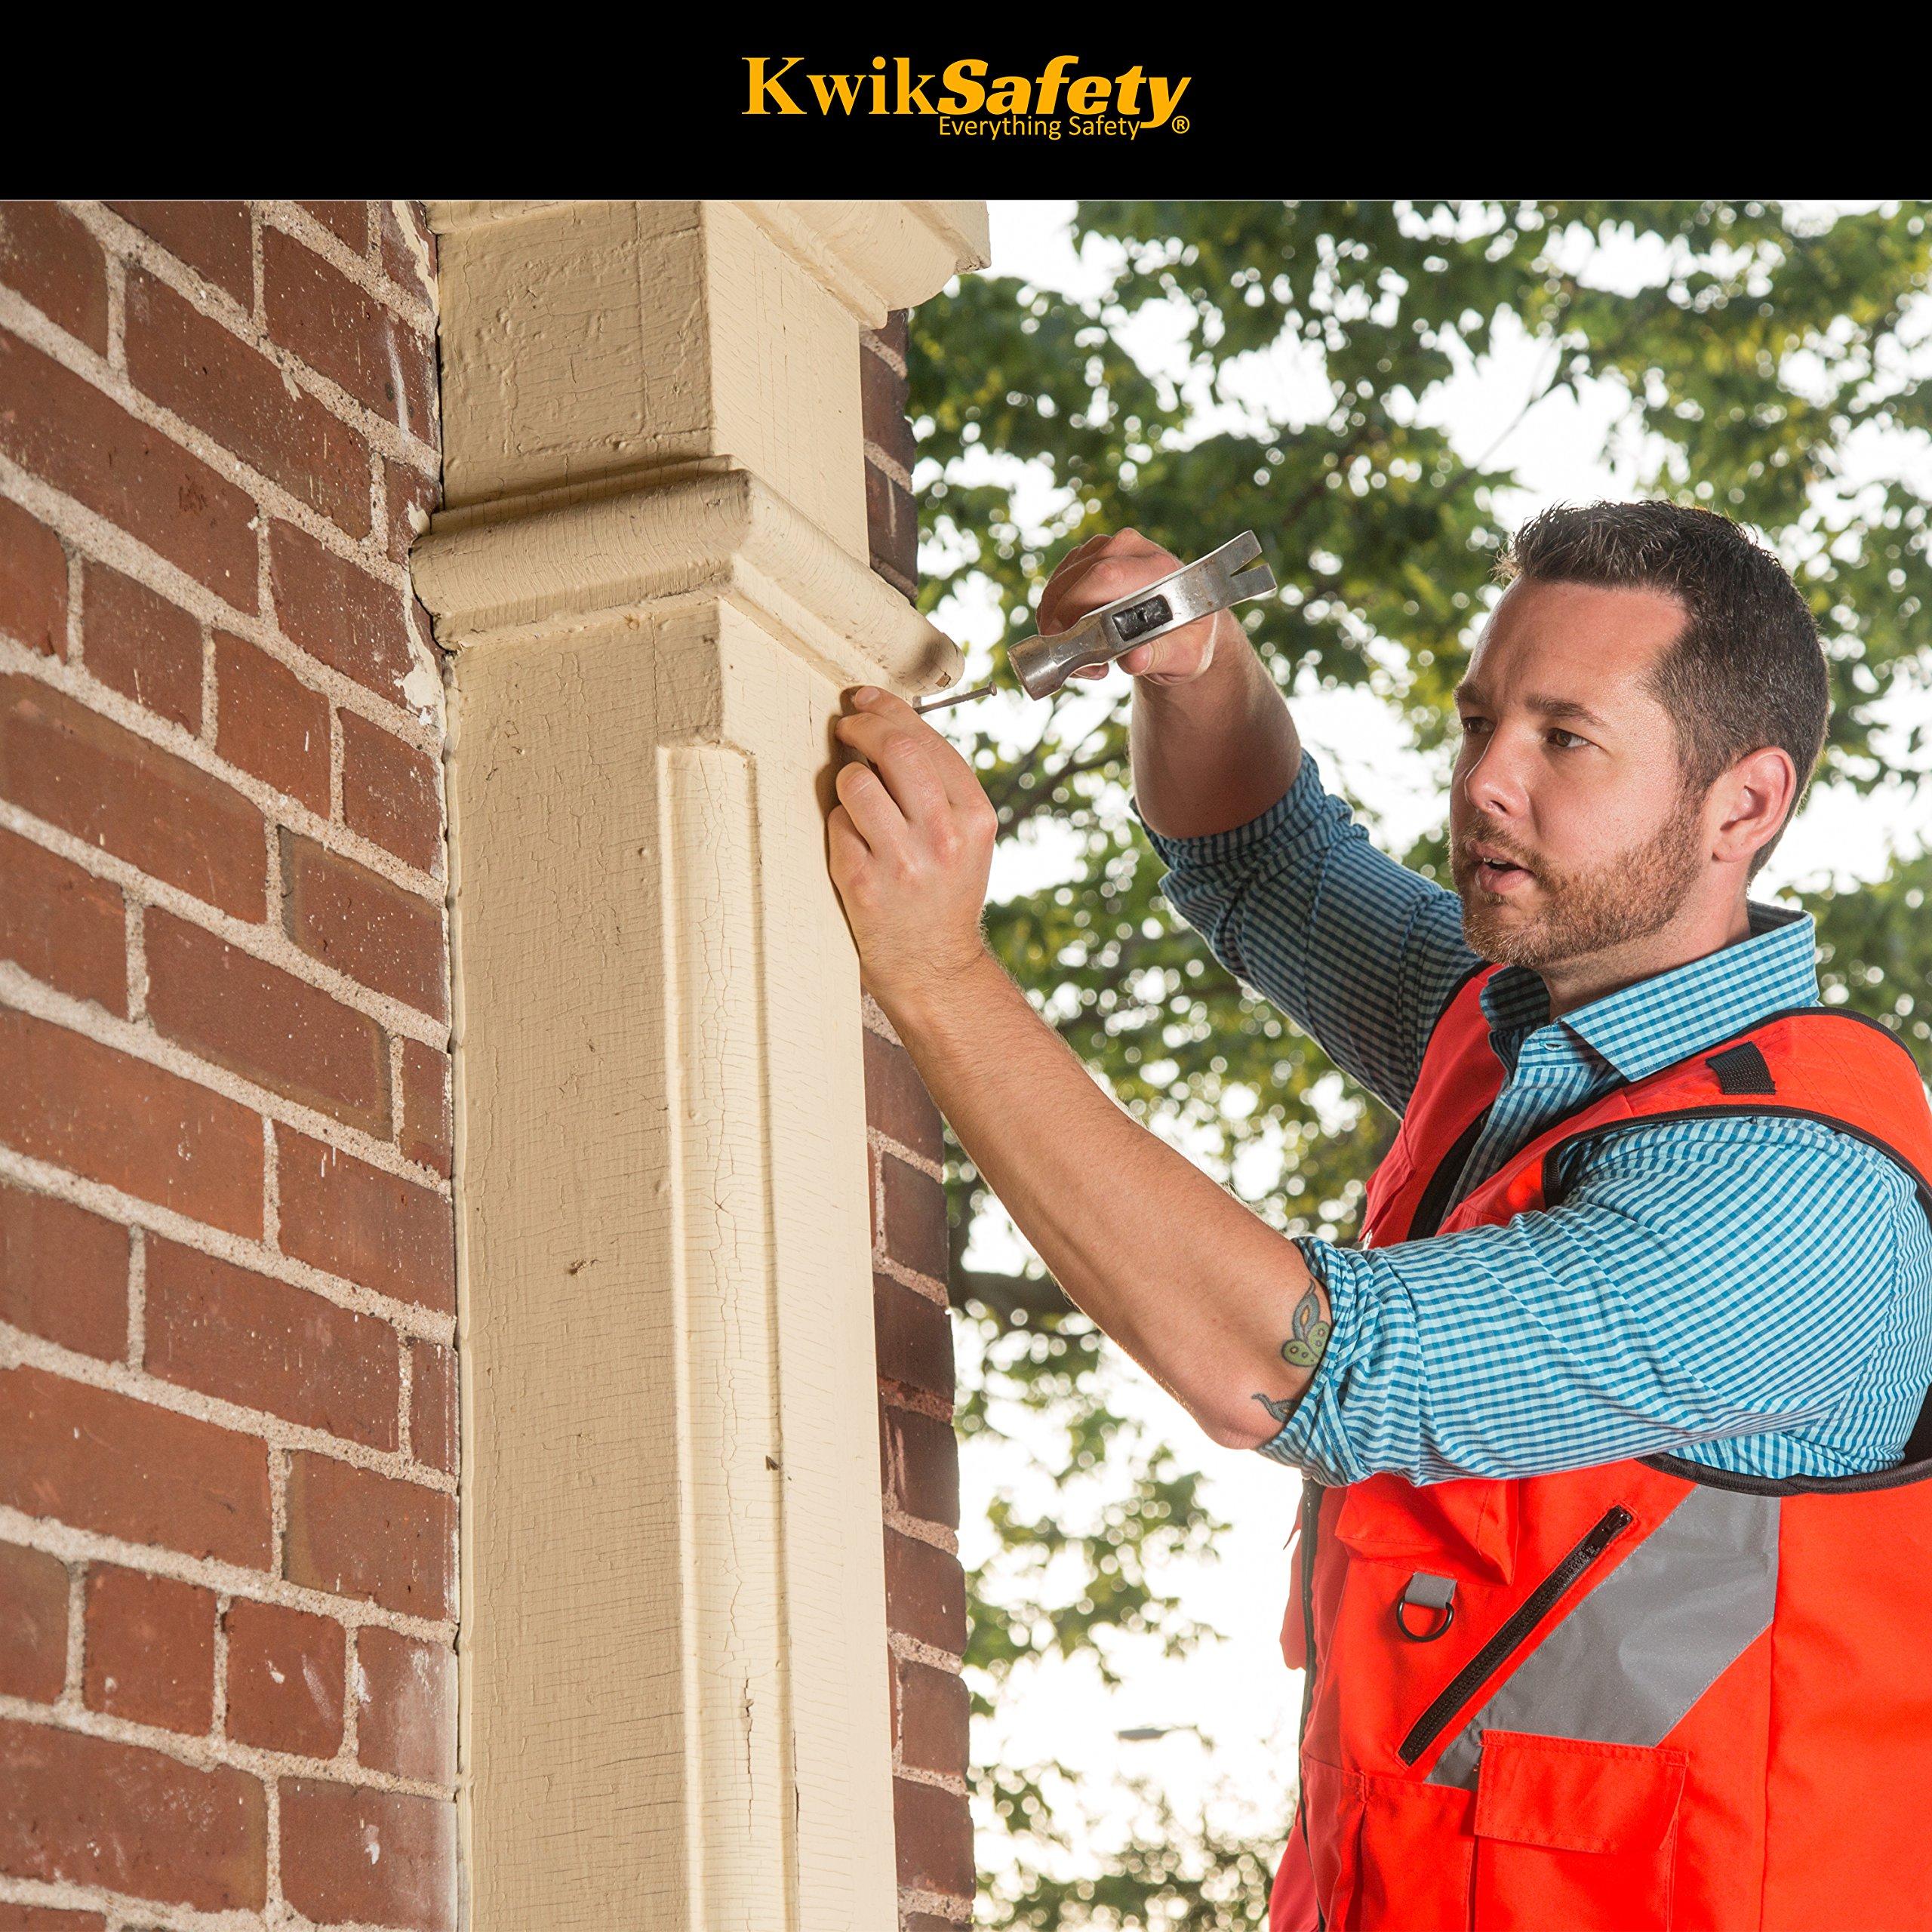 KwikSafety (Charlotte, NC) ARTISAN Tool Vest | Reflective Multi Pocket Lightweight Work Wear | Hi Vis Volunteer Emergency Crew Surveyor Carpenter Electrician Engineer | Men Women Regular | 4XL/5XL by KwikSafety (Image #10)